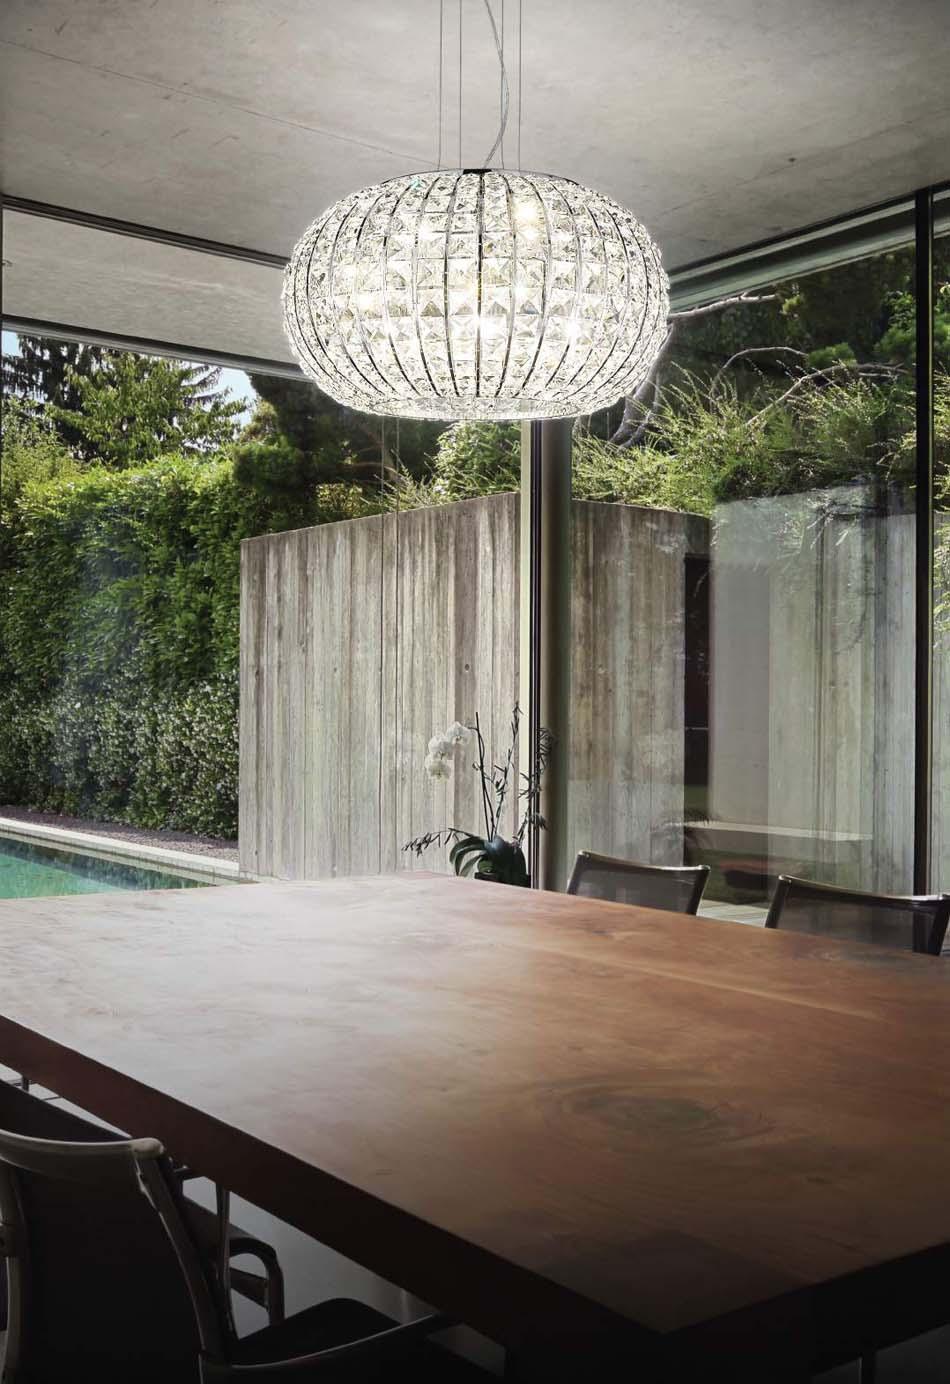 Lampade 35 sospese Ideal Lux Calypso – Toscana Arredamenti